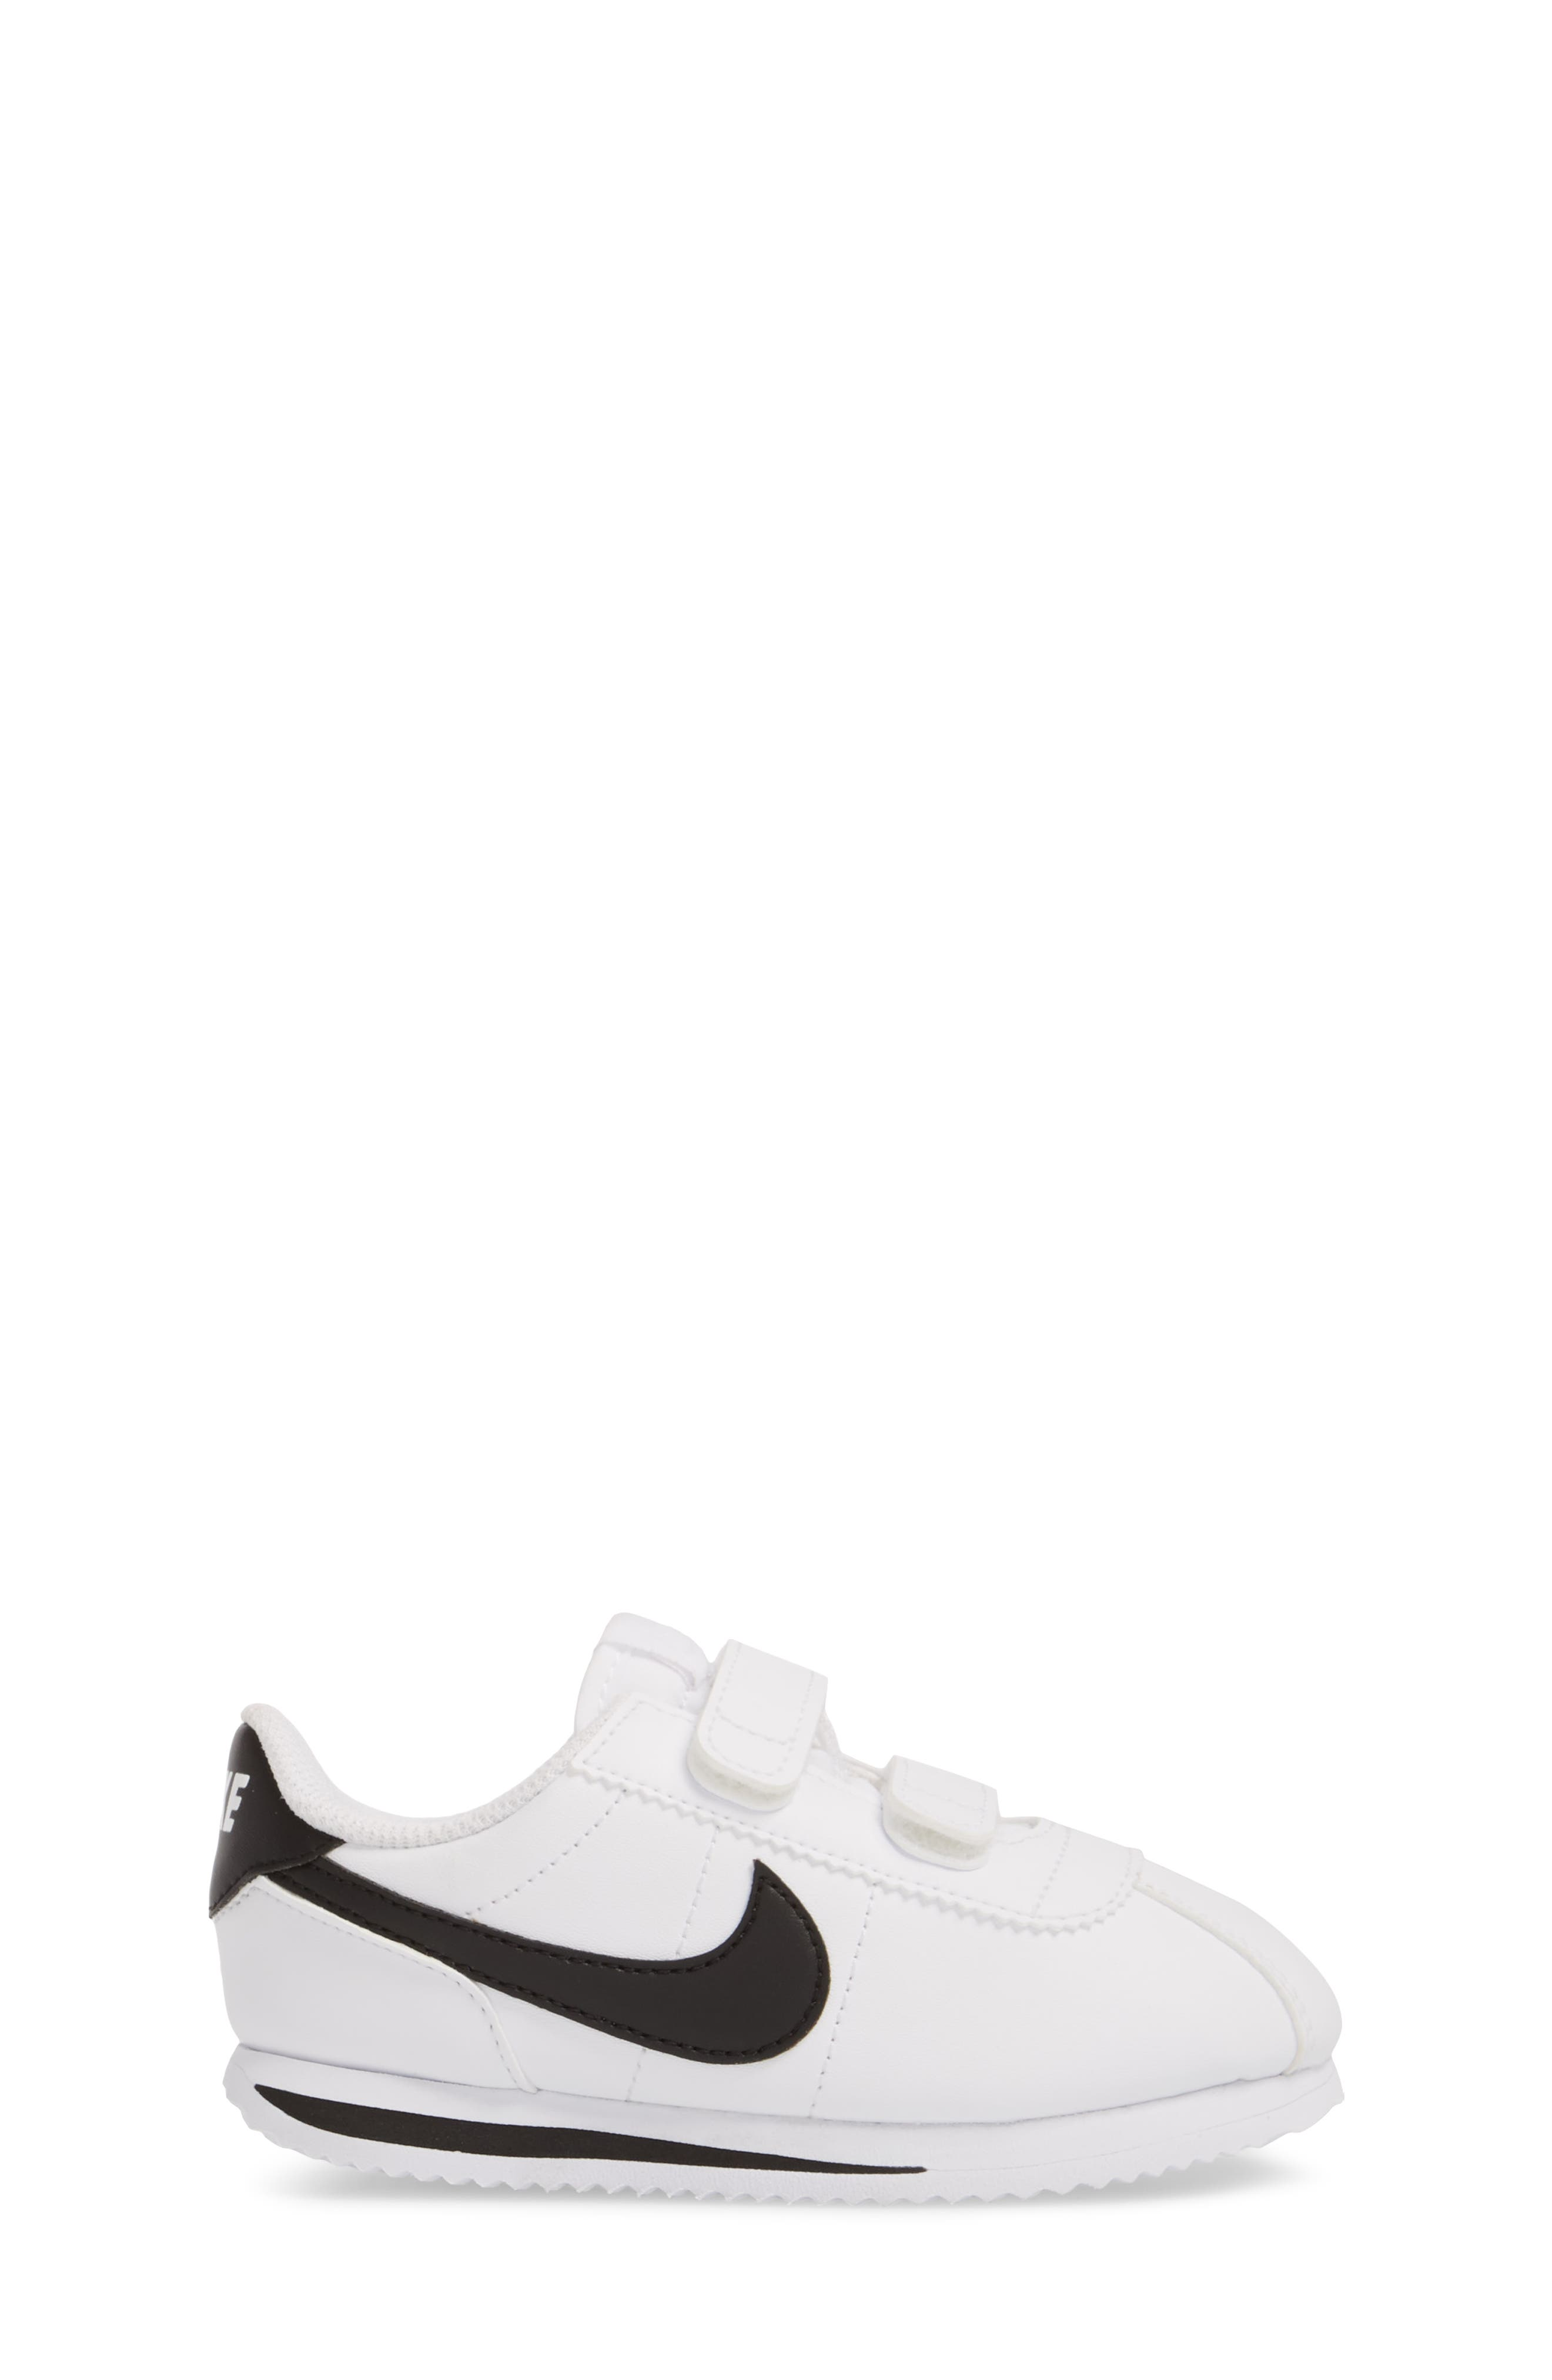 Cortez Basic SL Sneaker,                             Alternate thumbnail 3, color,                             WHITE/ BLACK